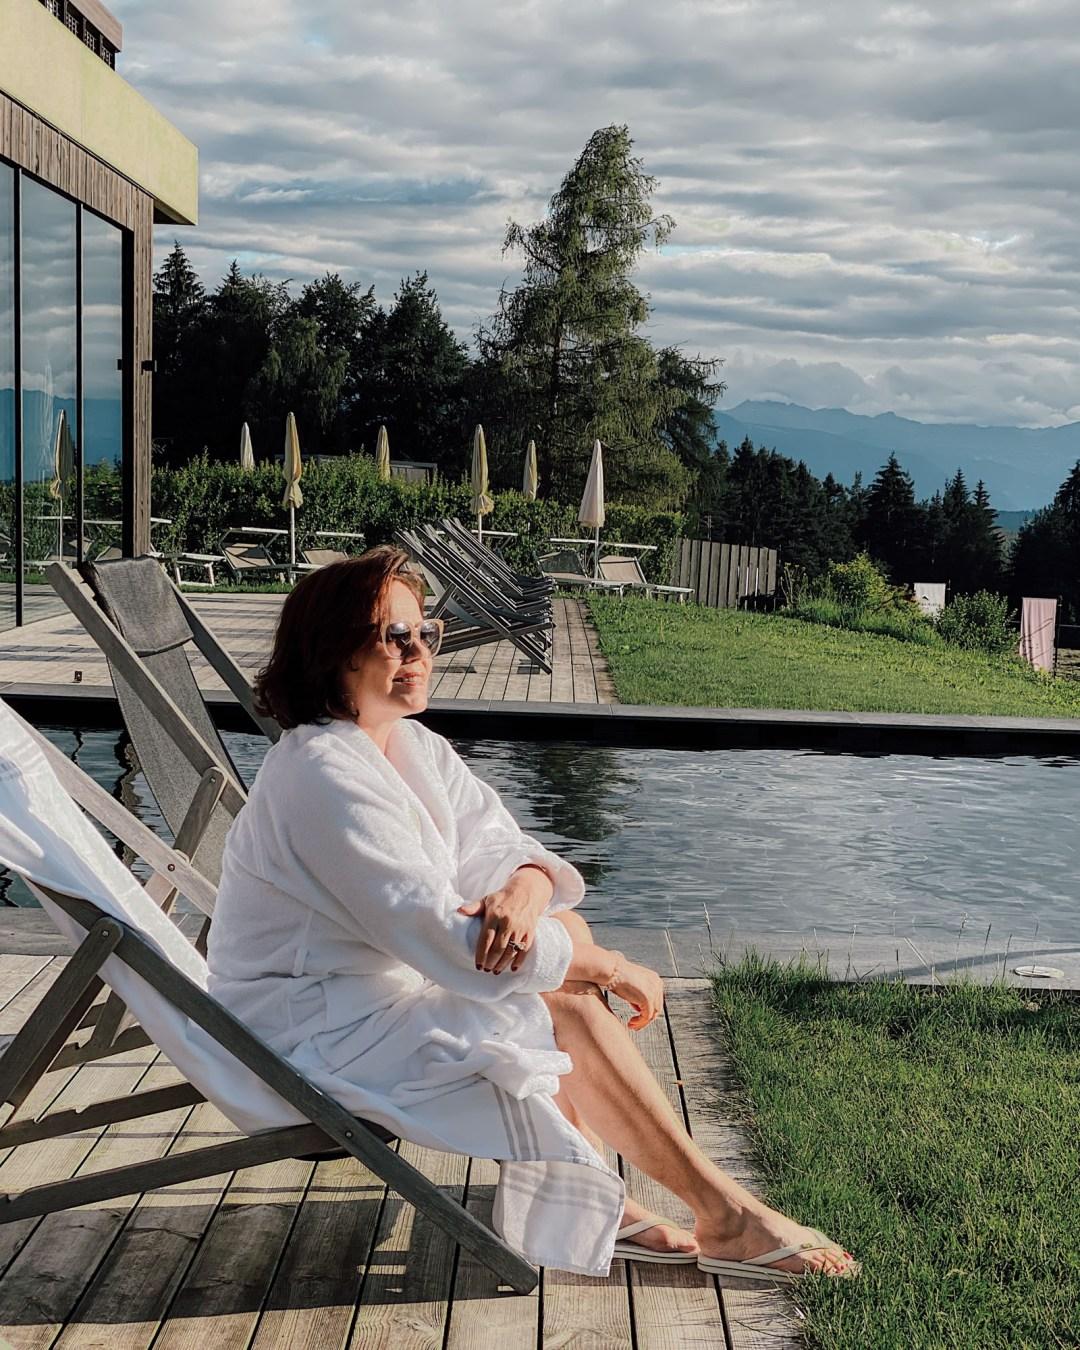 Inastil, Südtirol, Vitalpinahotels, Pflösl, Deutschnofen, Eggental, Latemar, Dolomiten, Travelblogger, Ü50Blogger, Urlaub, Ü50Lifestyle, Reiseblogger, Ü50Reisen-80